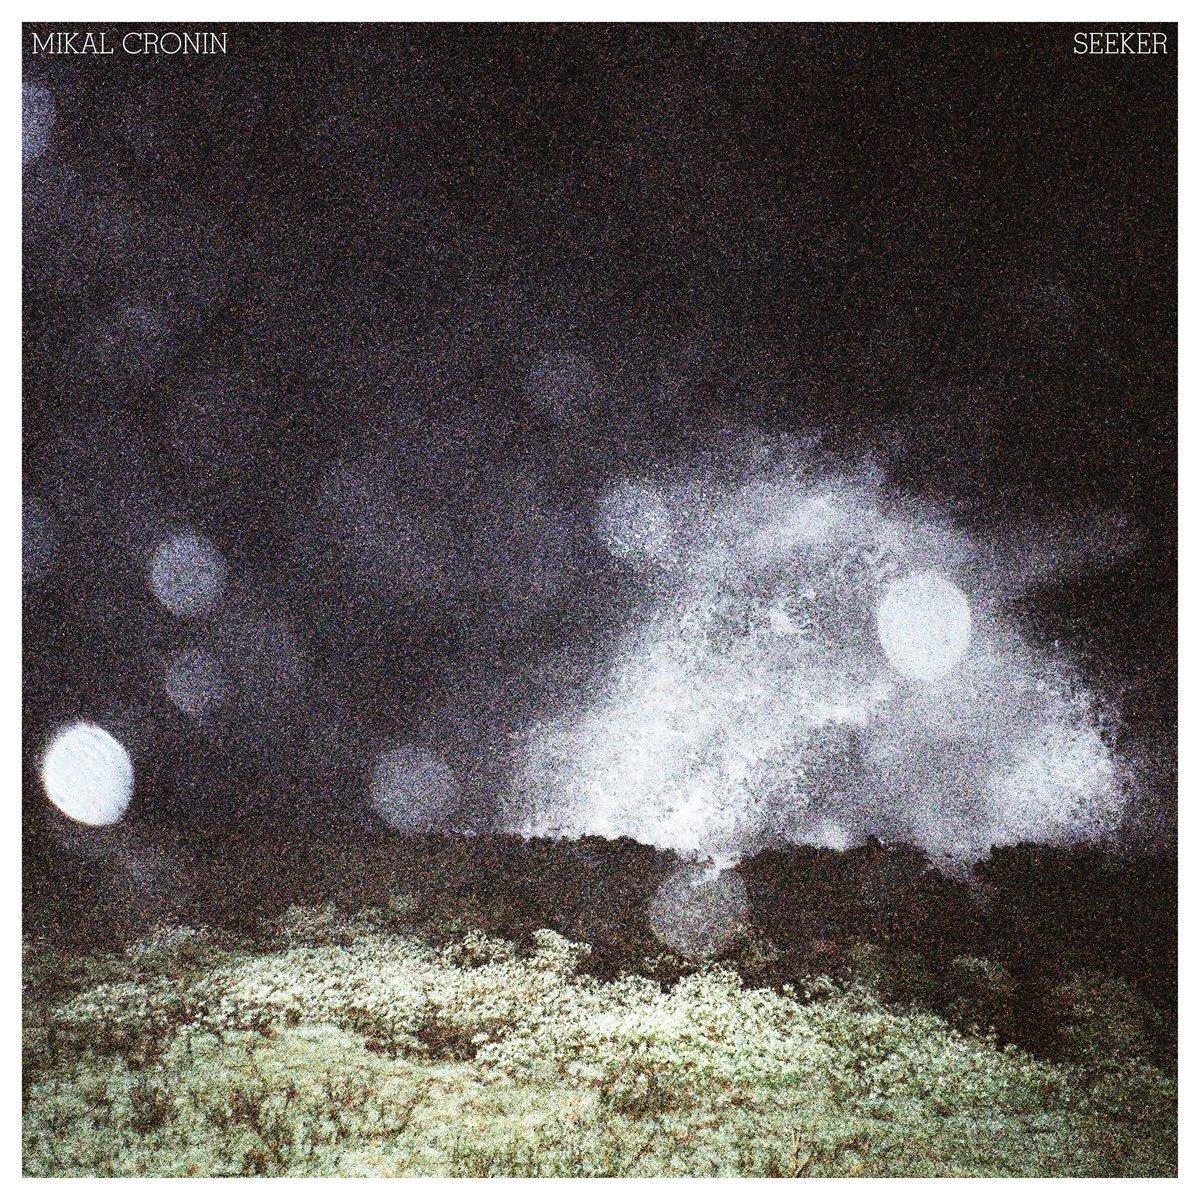 ALBUM REVIEW: Mikal Cronin - Seeker